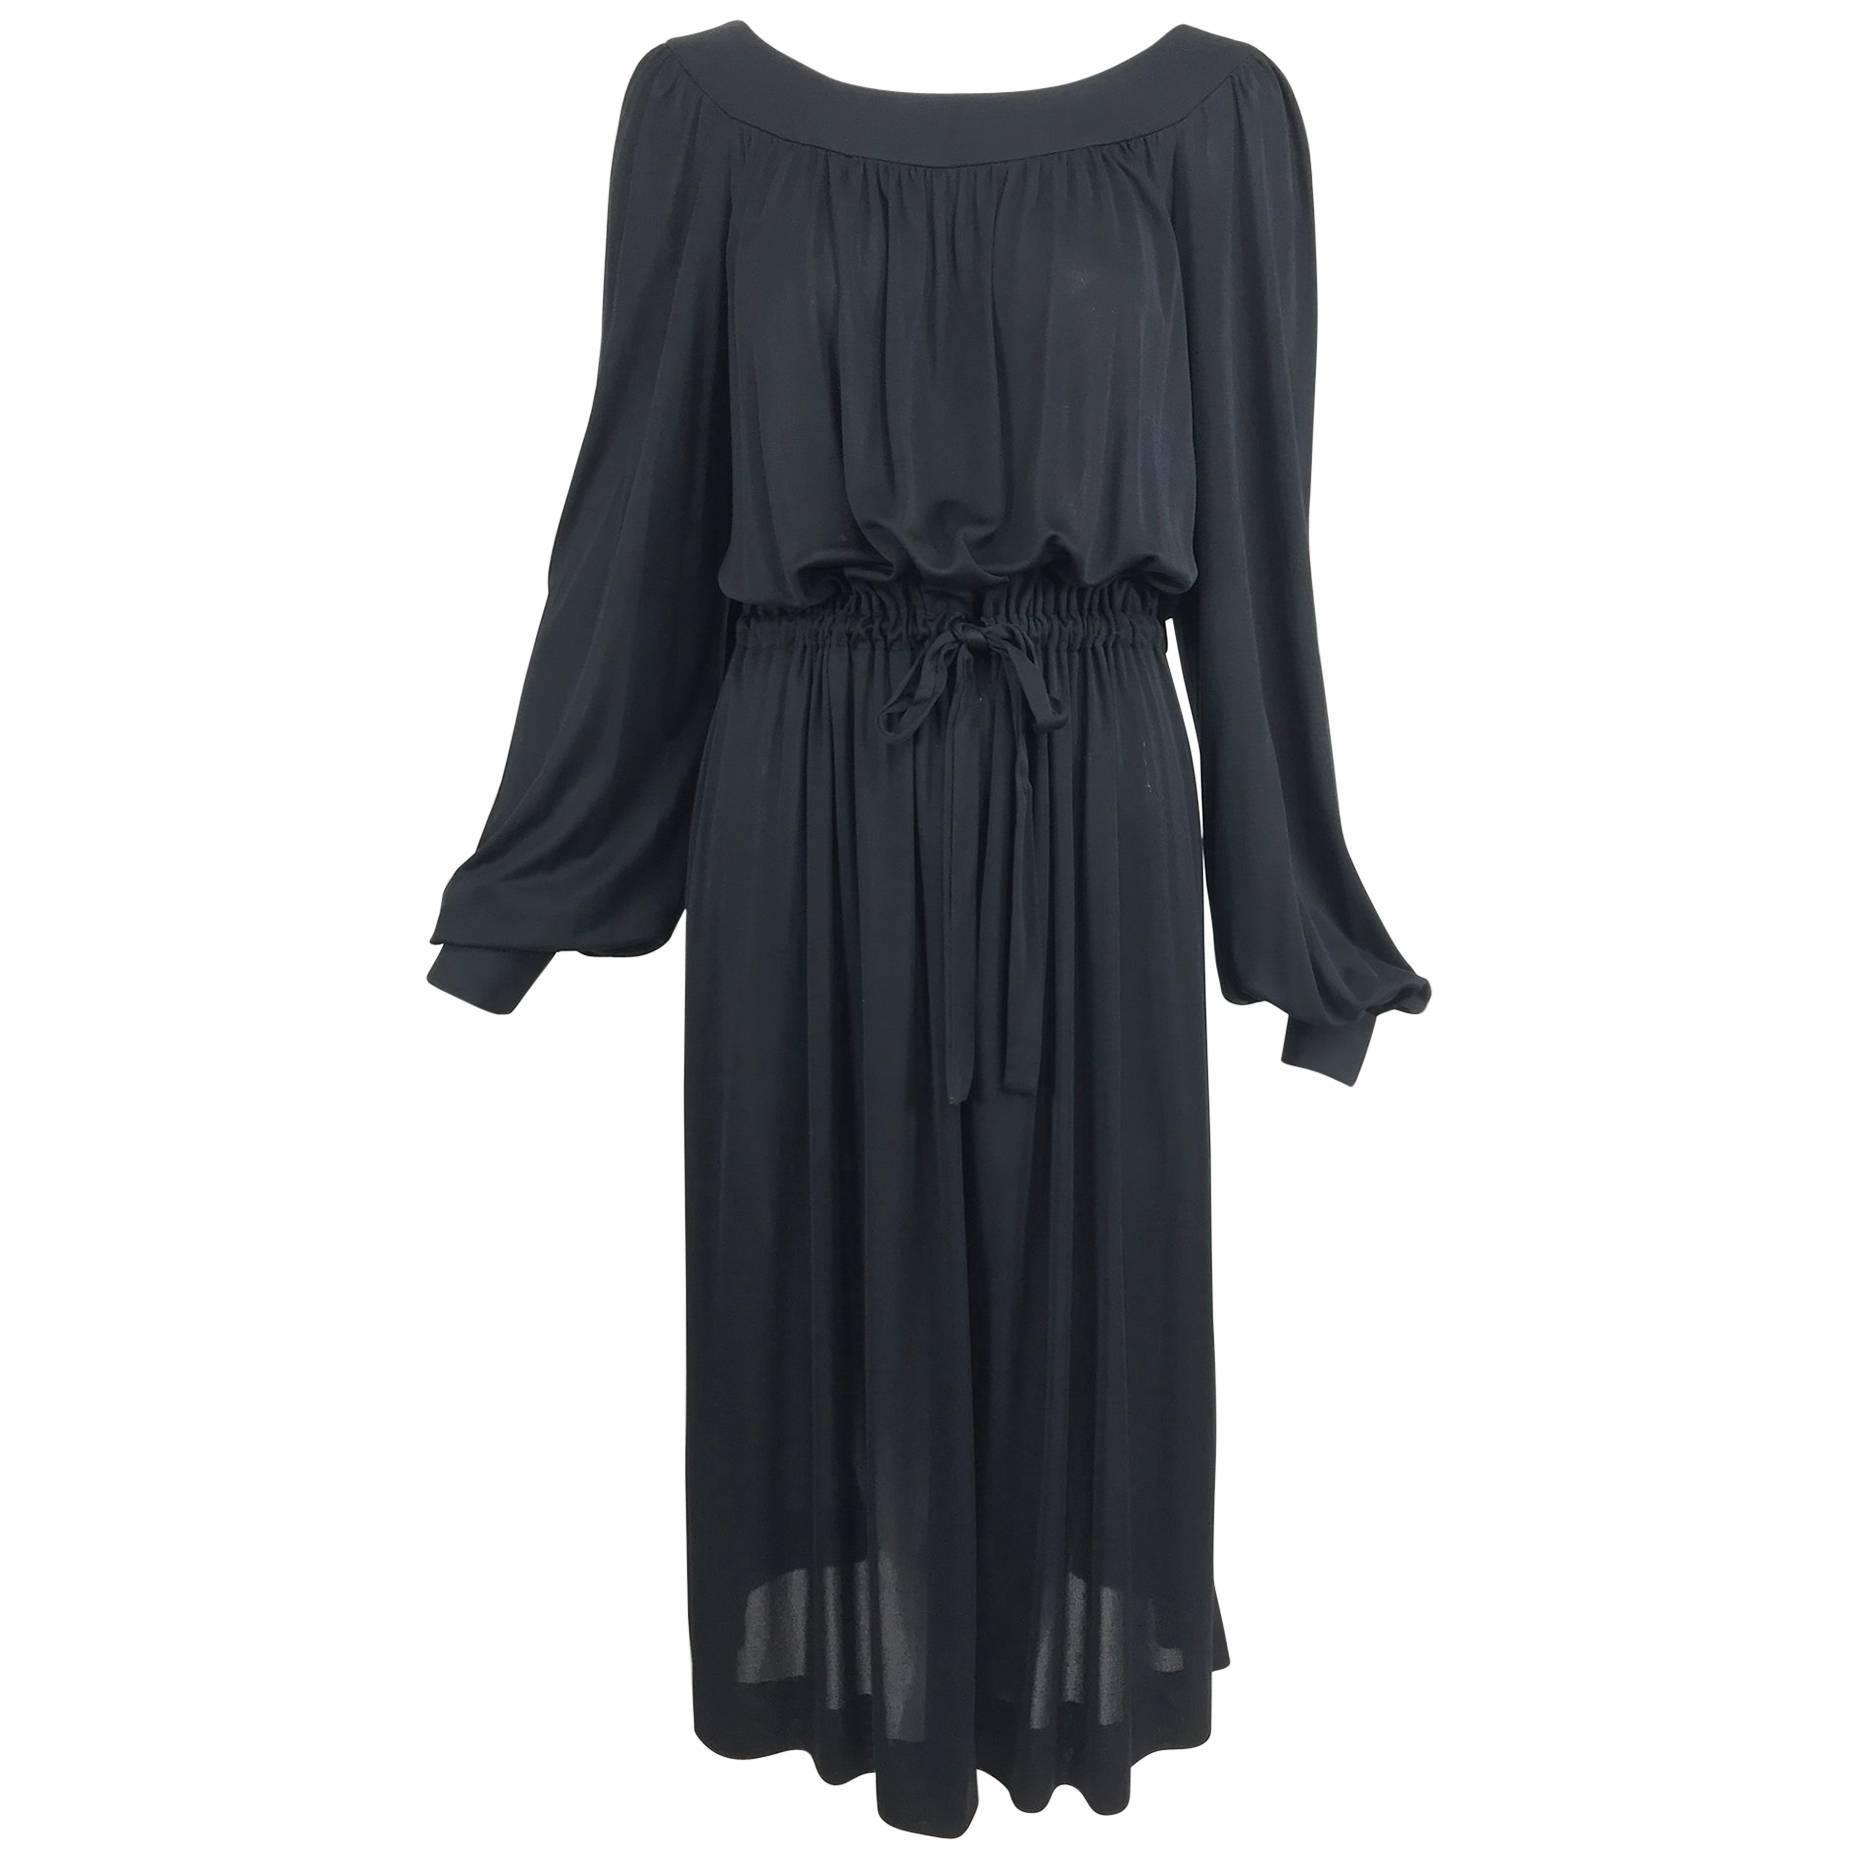 Pucci Black silk jersey draw string waist dress 1960s